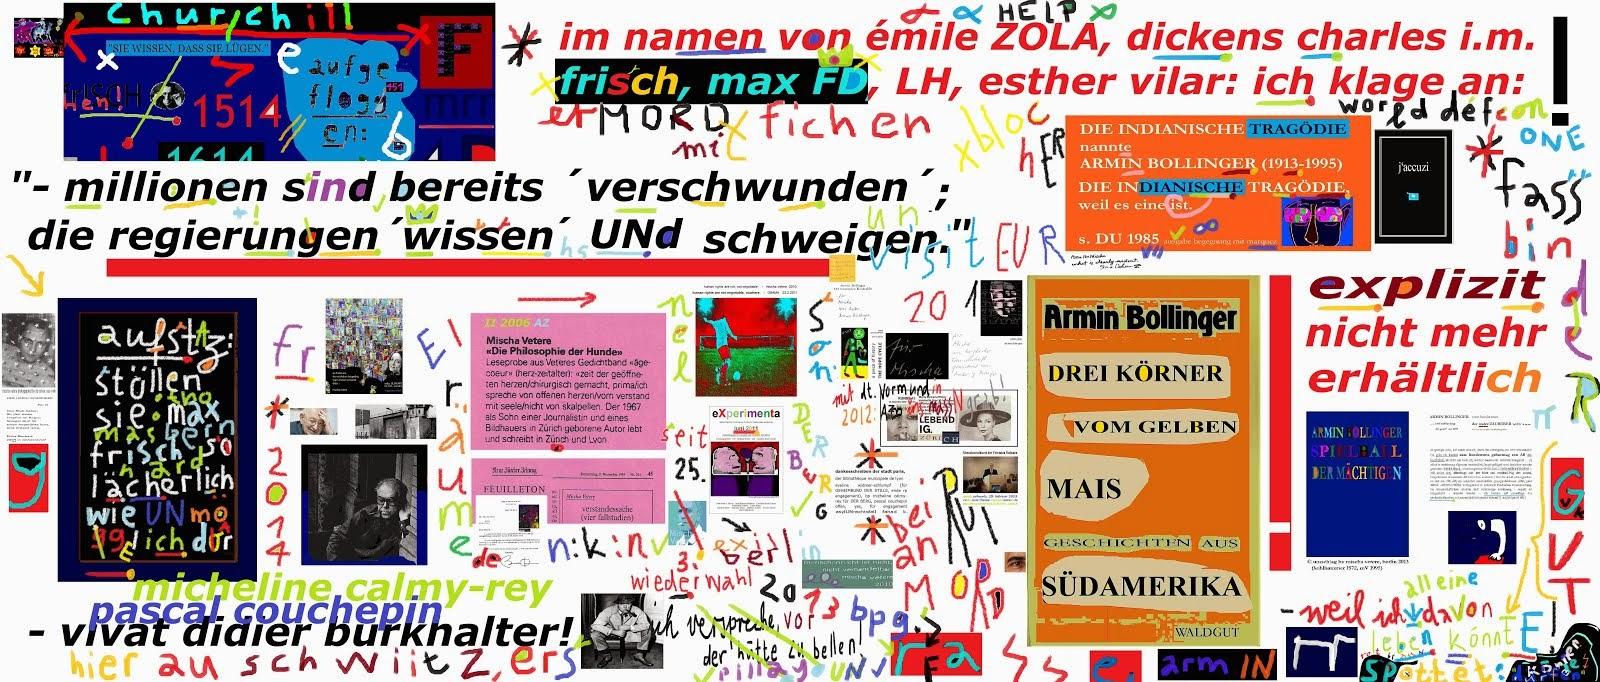 zensur in deutschland - microsoft - hackers - rezeption von e-kunst mischa vetere vs bill gates